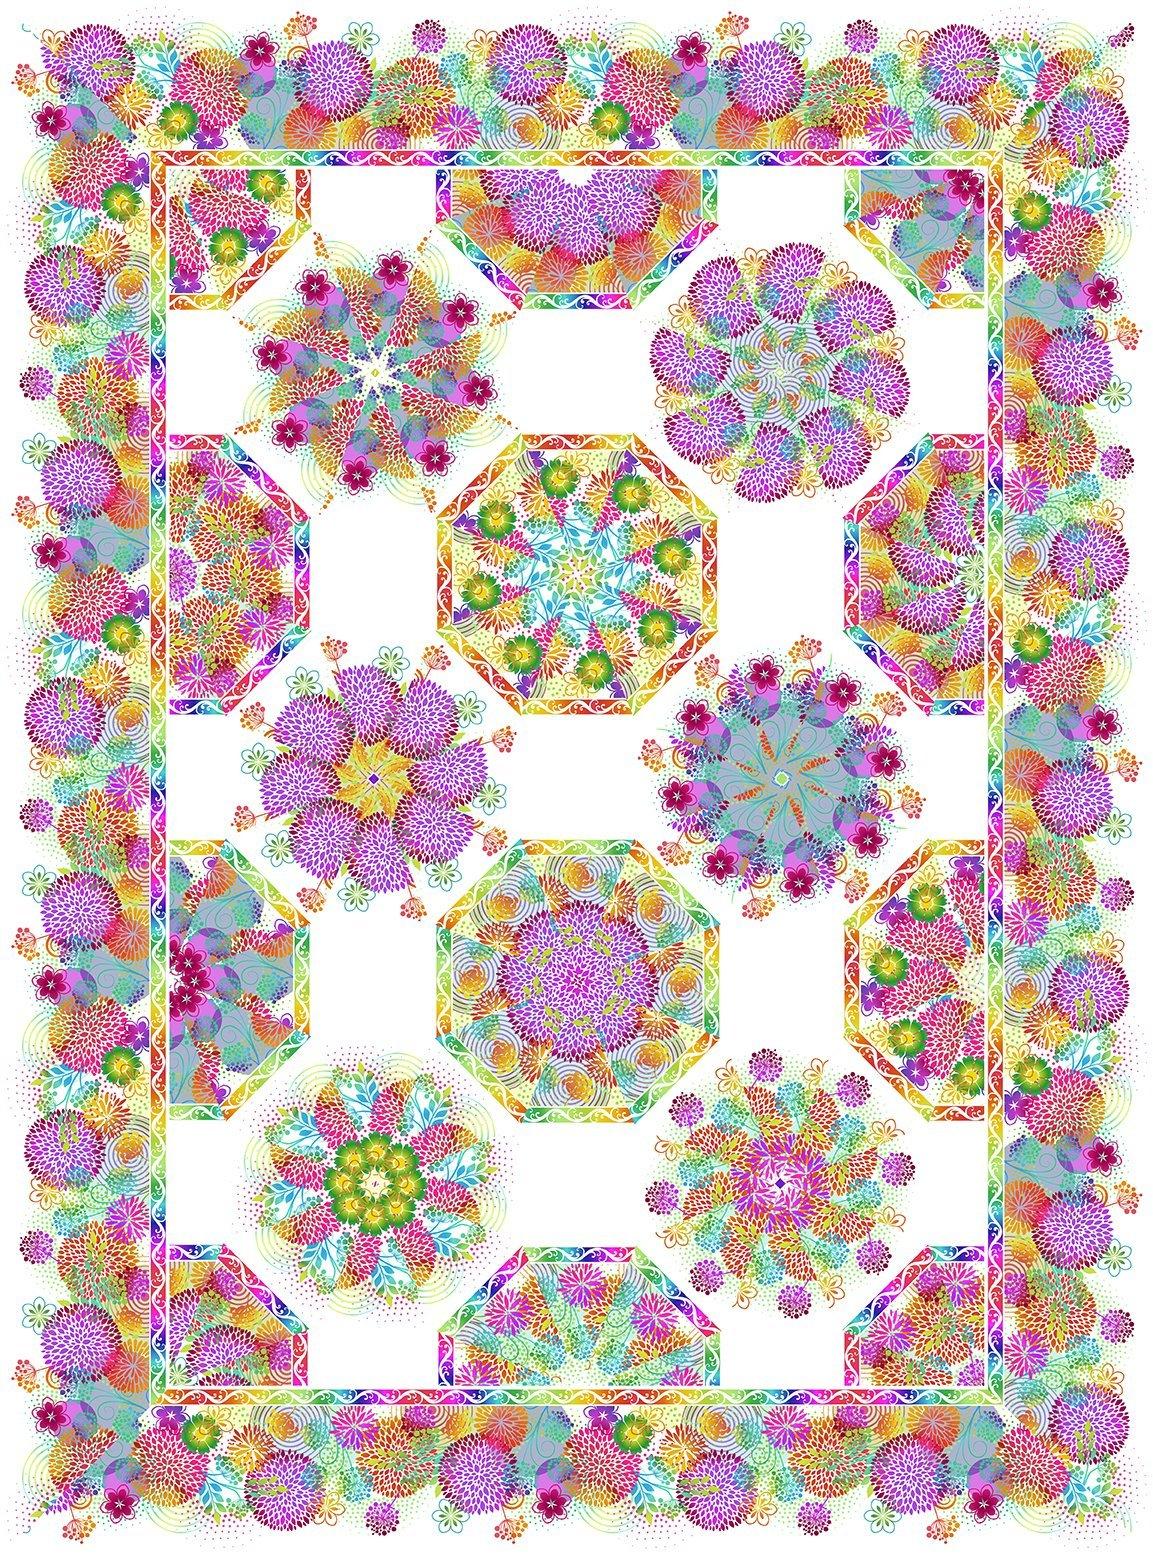 Unusual Garden II One-Fabric Kaleidoscope Quilt Kit - White